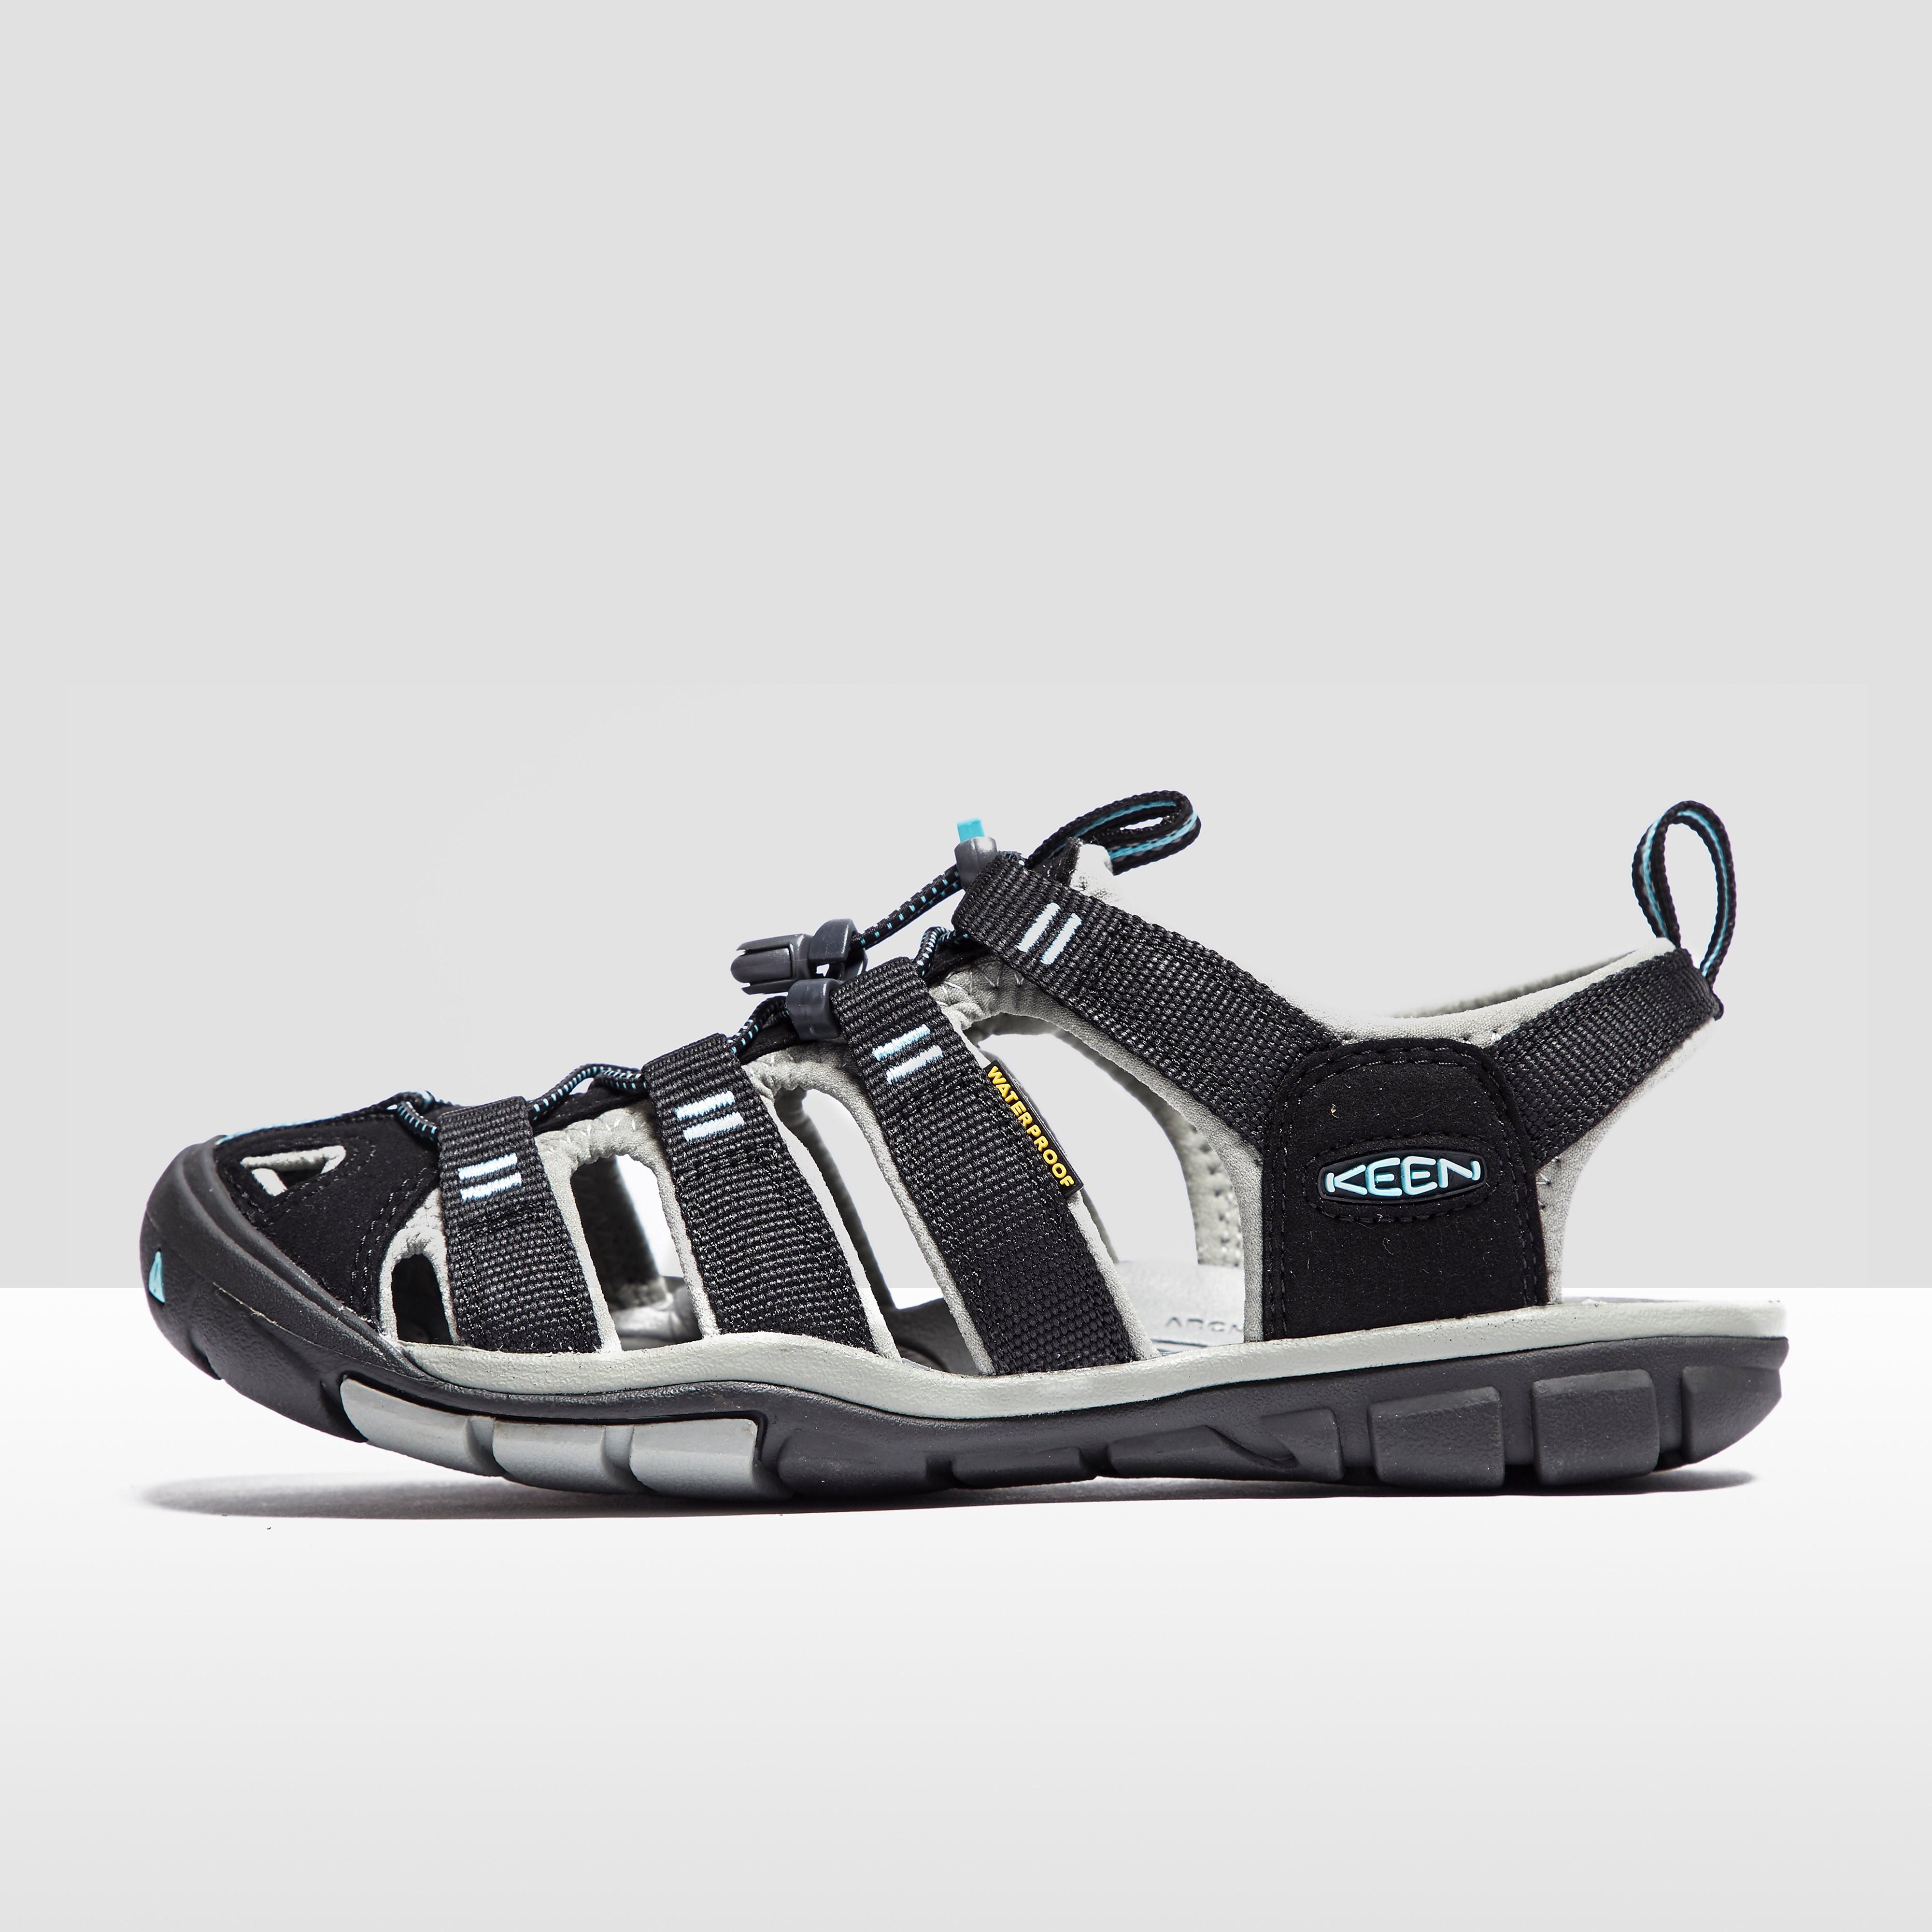 Keen Clearwater CNX Women's Sandals